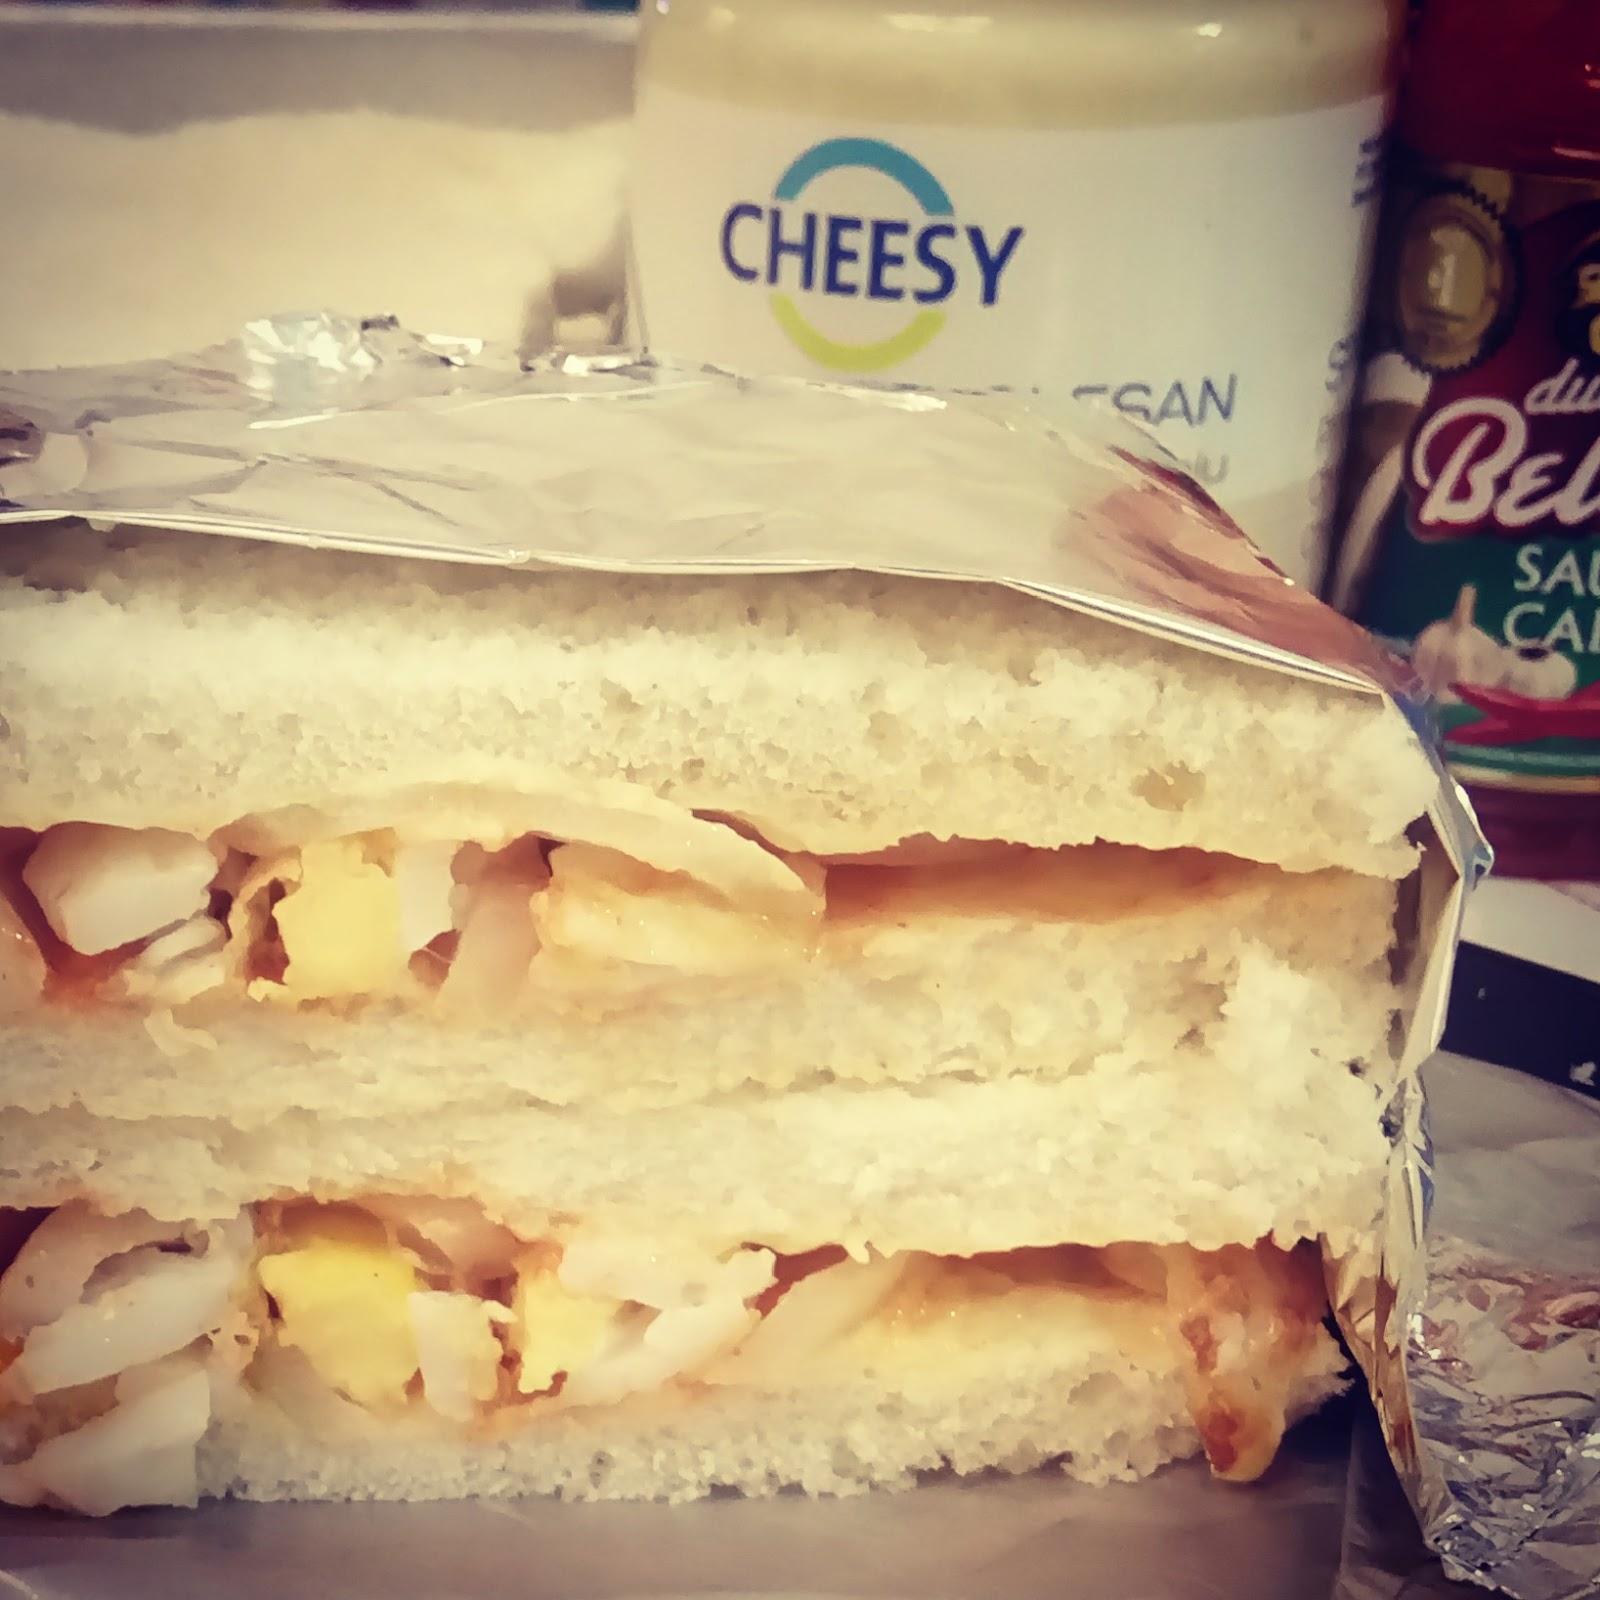 Resep Sandwich Cheesy yang Enak